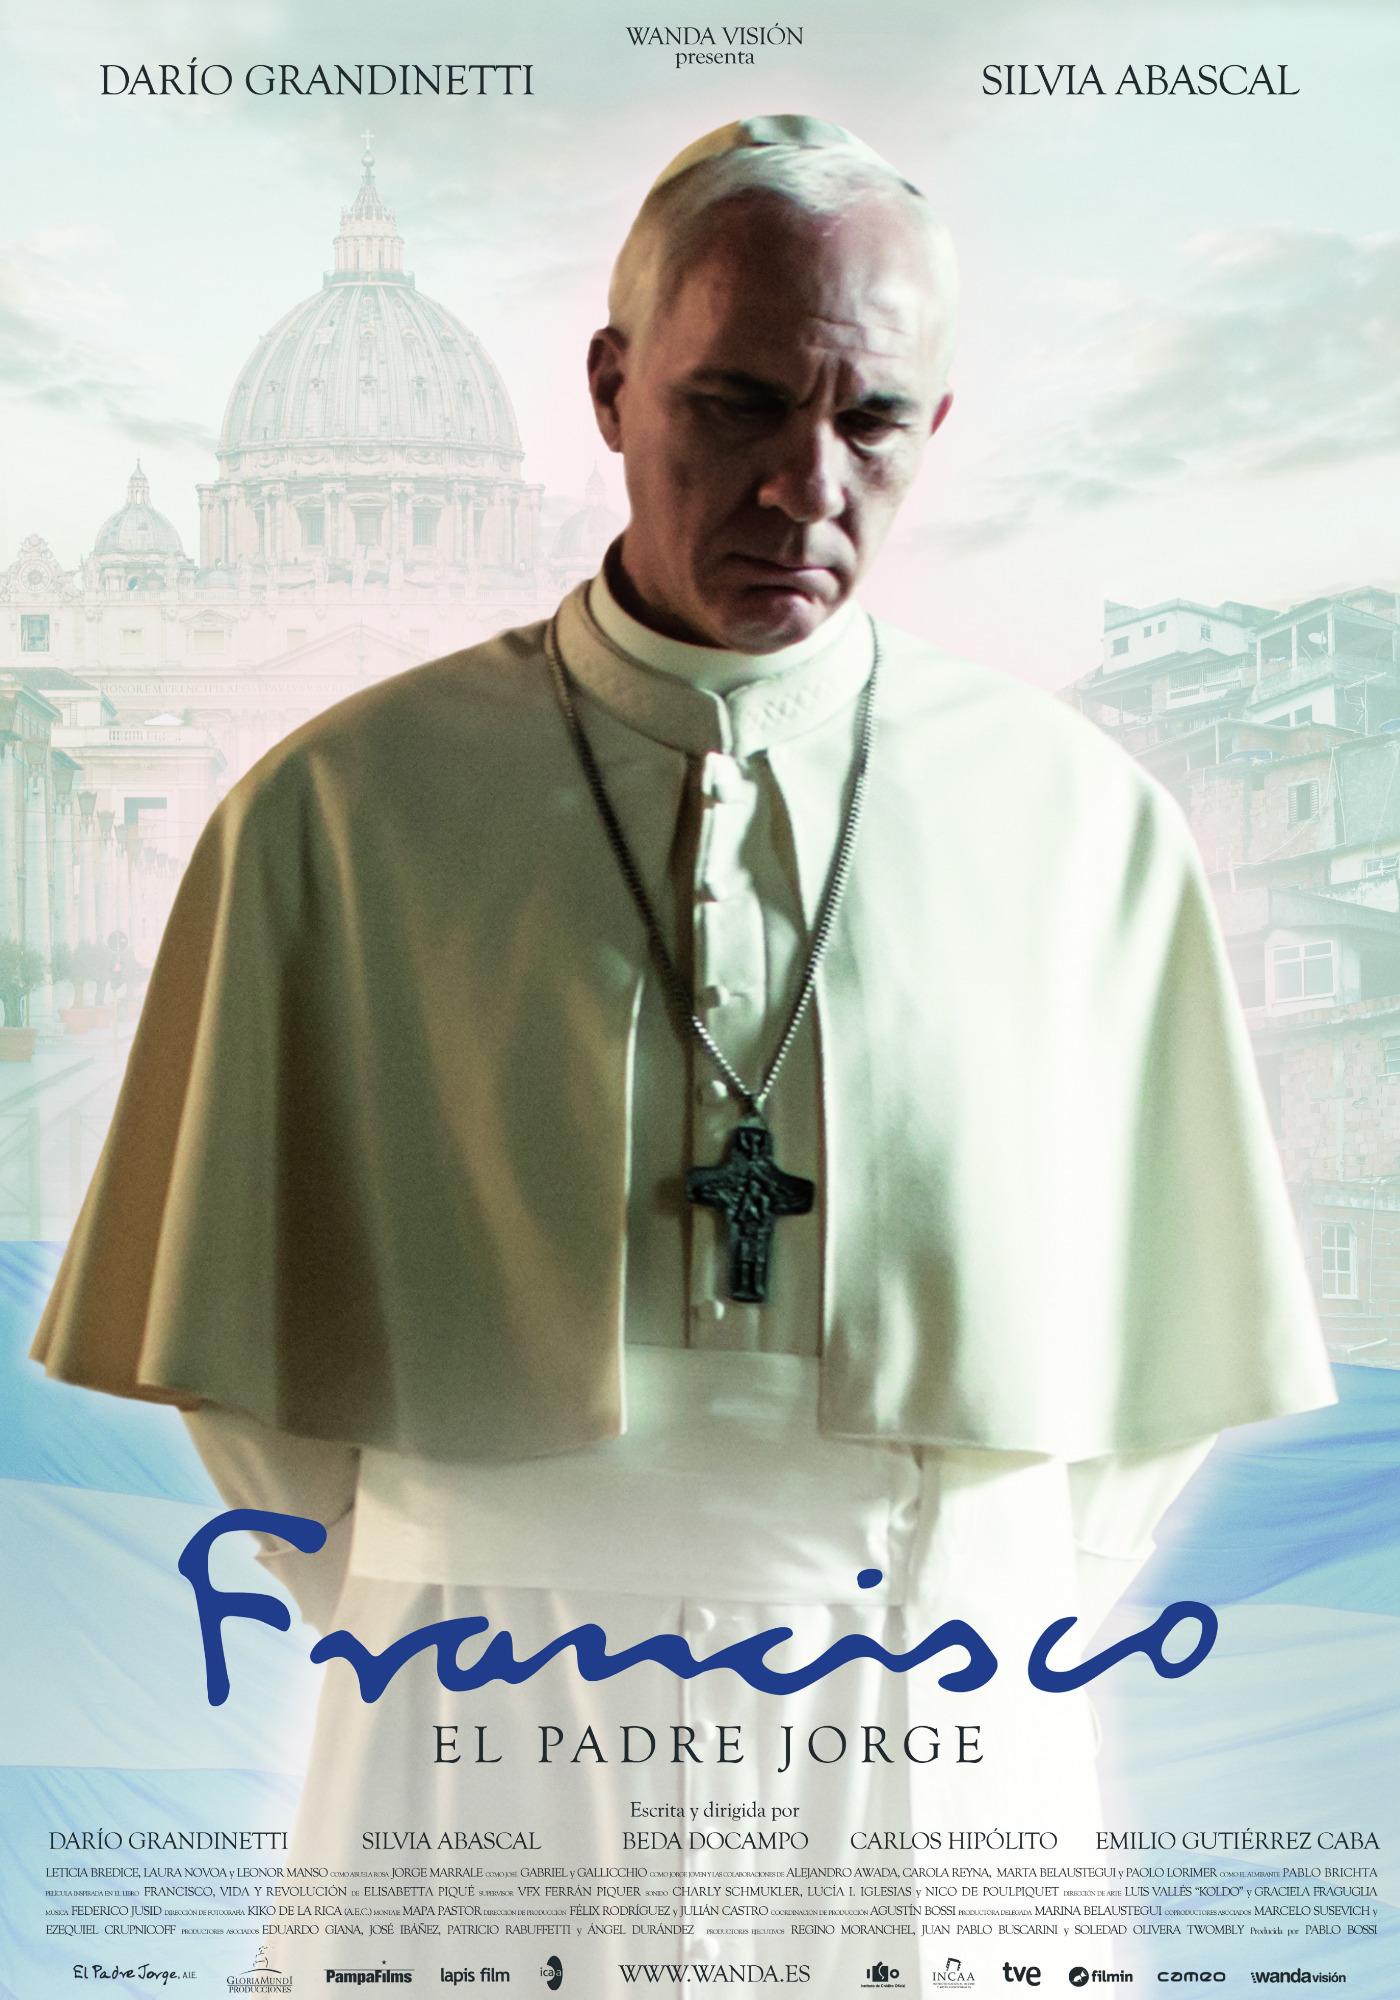 Ver Francisco El Padre Jorge Online (2015) Bergoglio, el Papa Francisco Gratis HD Pelicula Completa